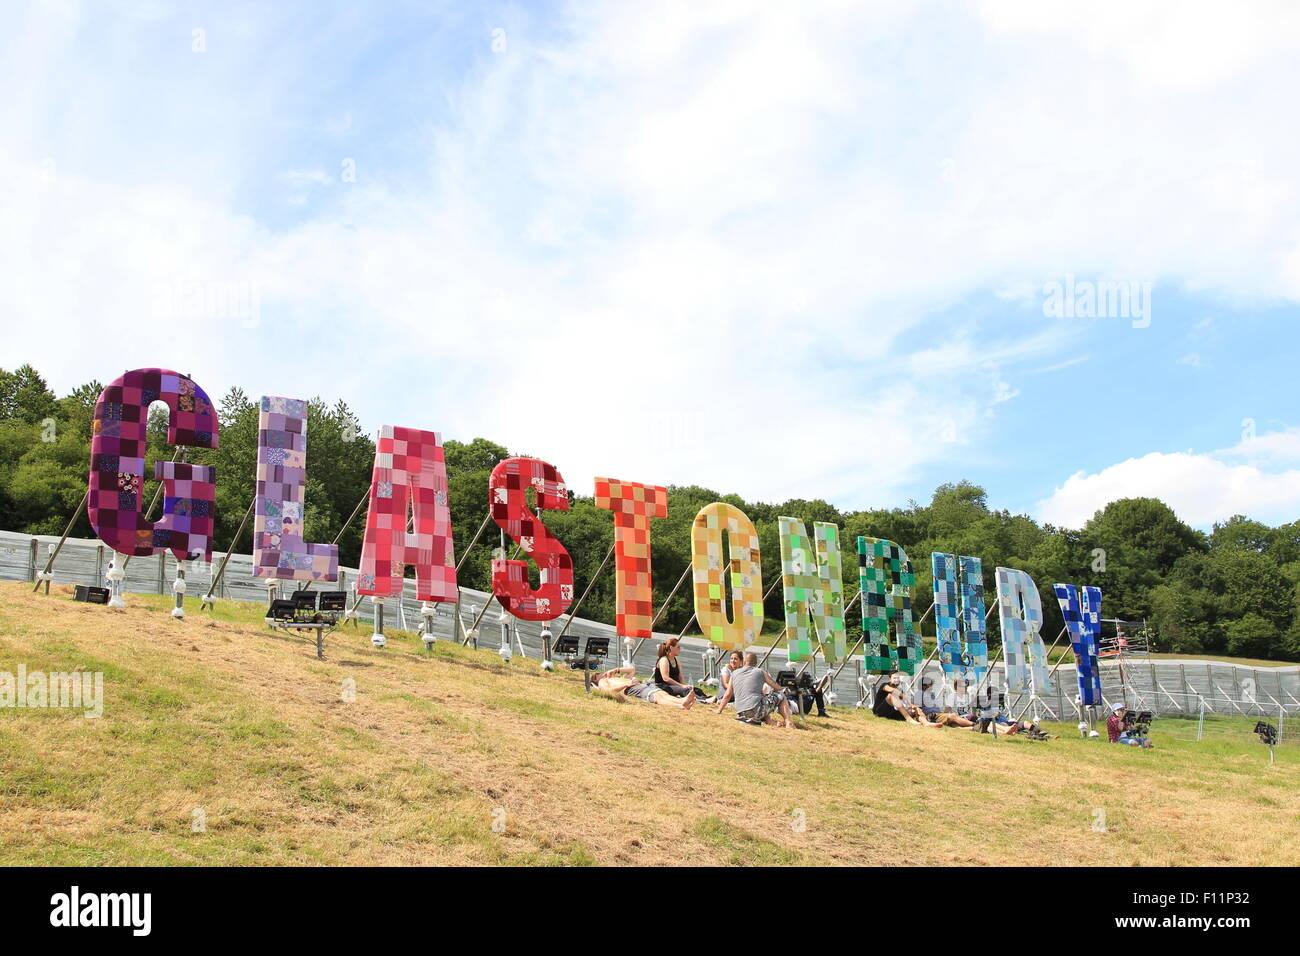 Glastonbury Festival 2015 - Tag 1 - Atmosphäre Mitwirkende: Atmosphäre wo: Somerset, Vereinigtes Königreich Stockbild